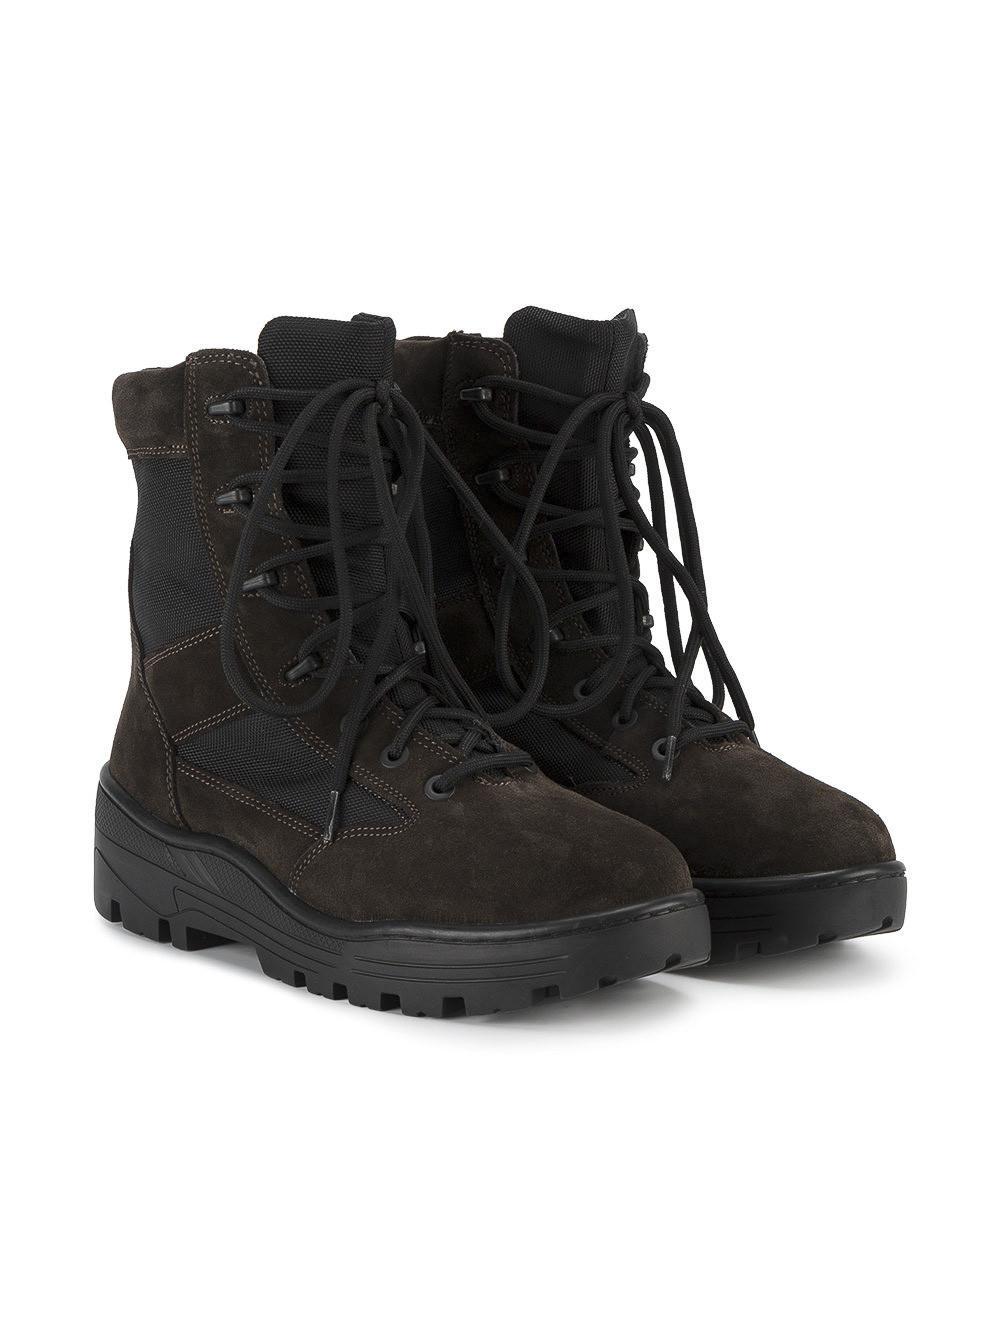 7d2e6aec62a Yeezy - Black Lace Up Combat Boots for Men - Lyst. View fullscreen